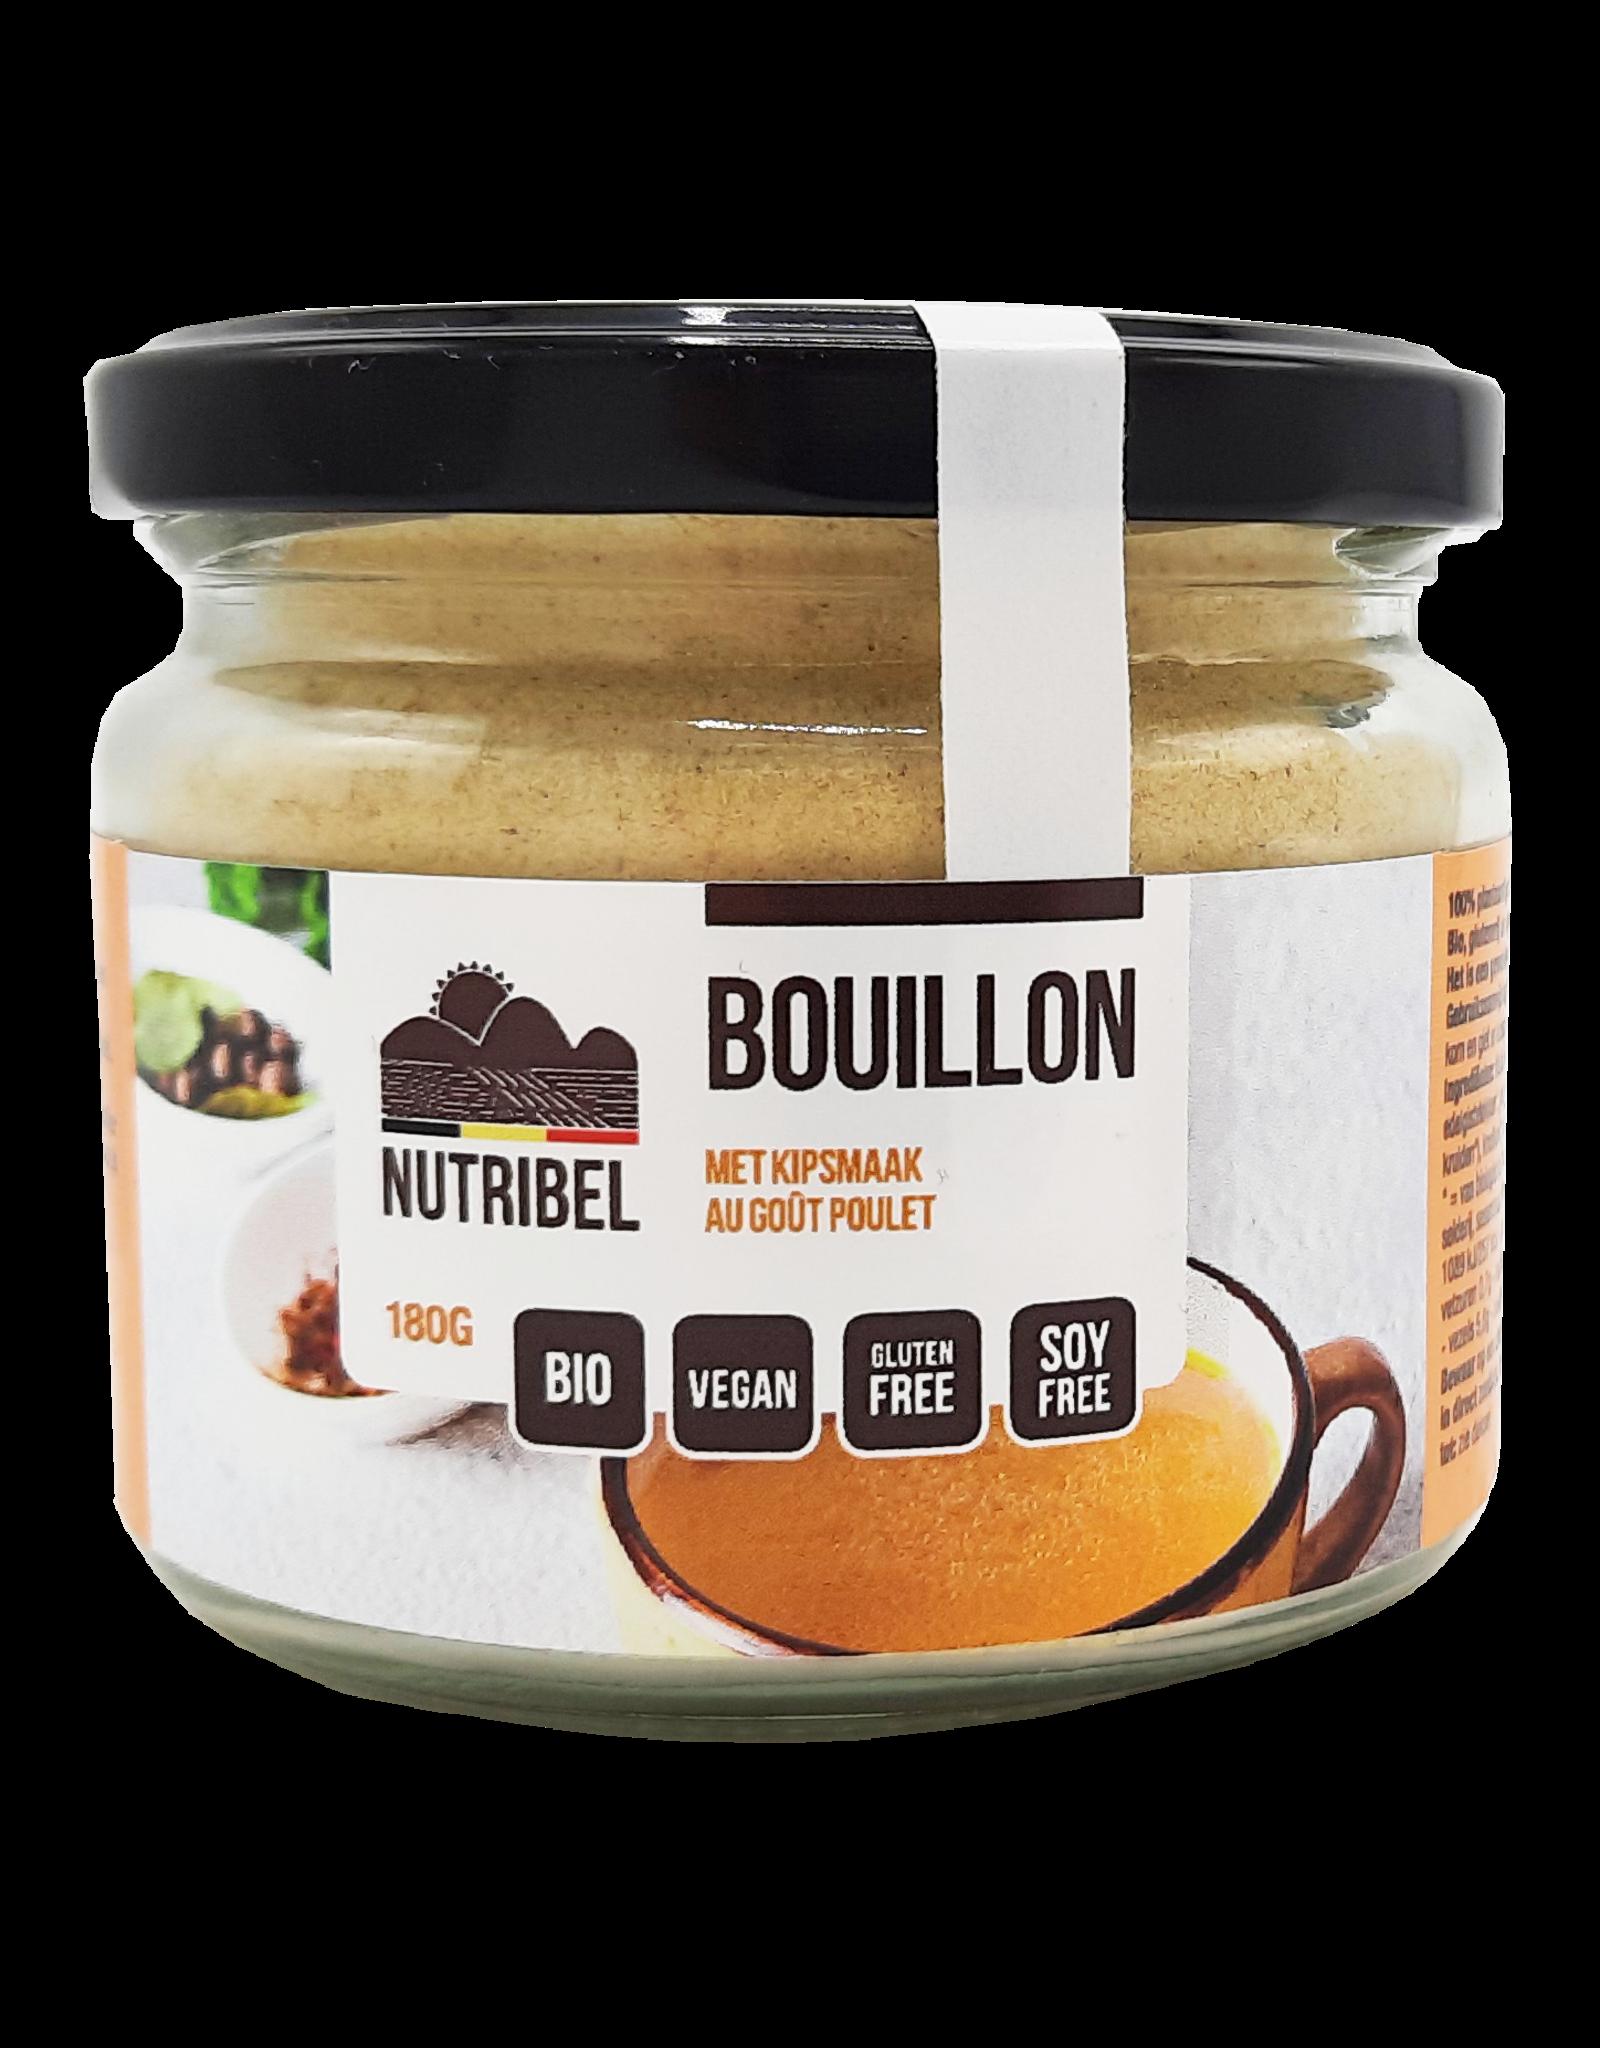 Nutribel Bouillon kipsmaak vegan bio 180g